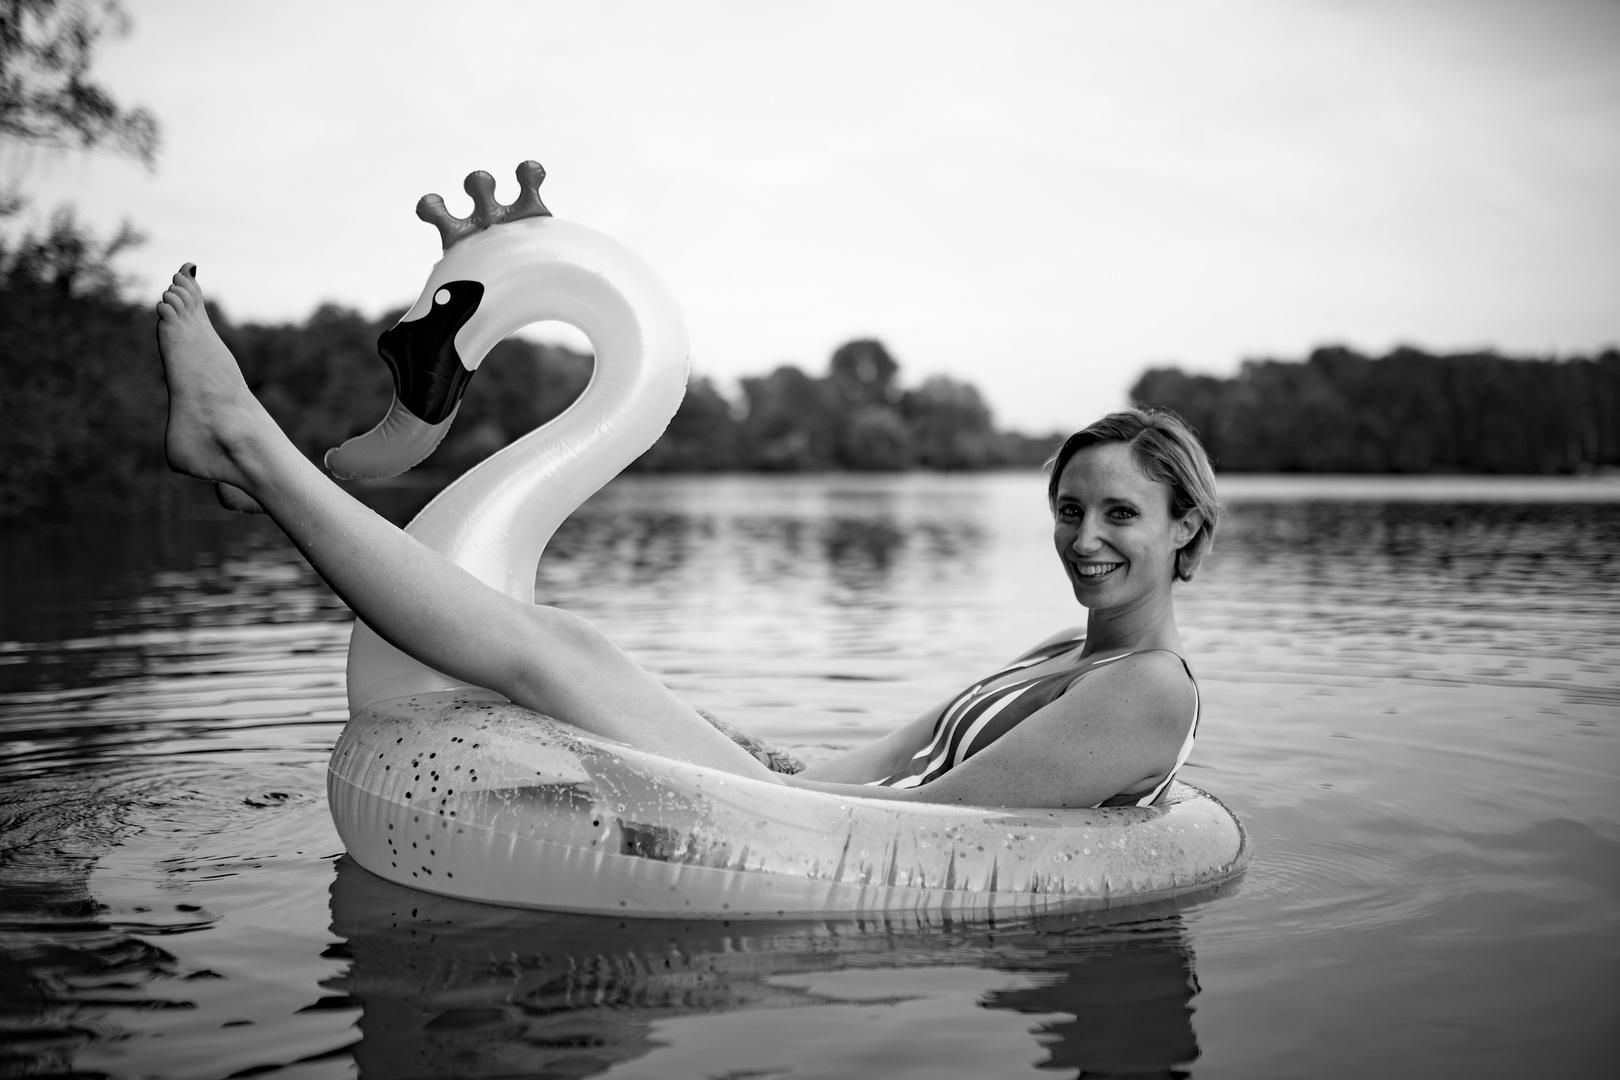 riding the swan III